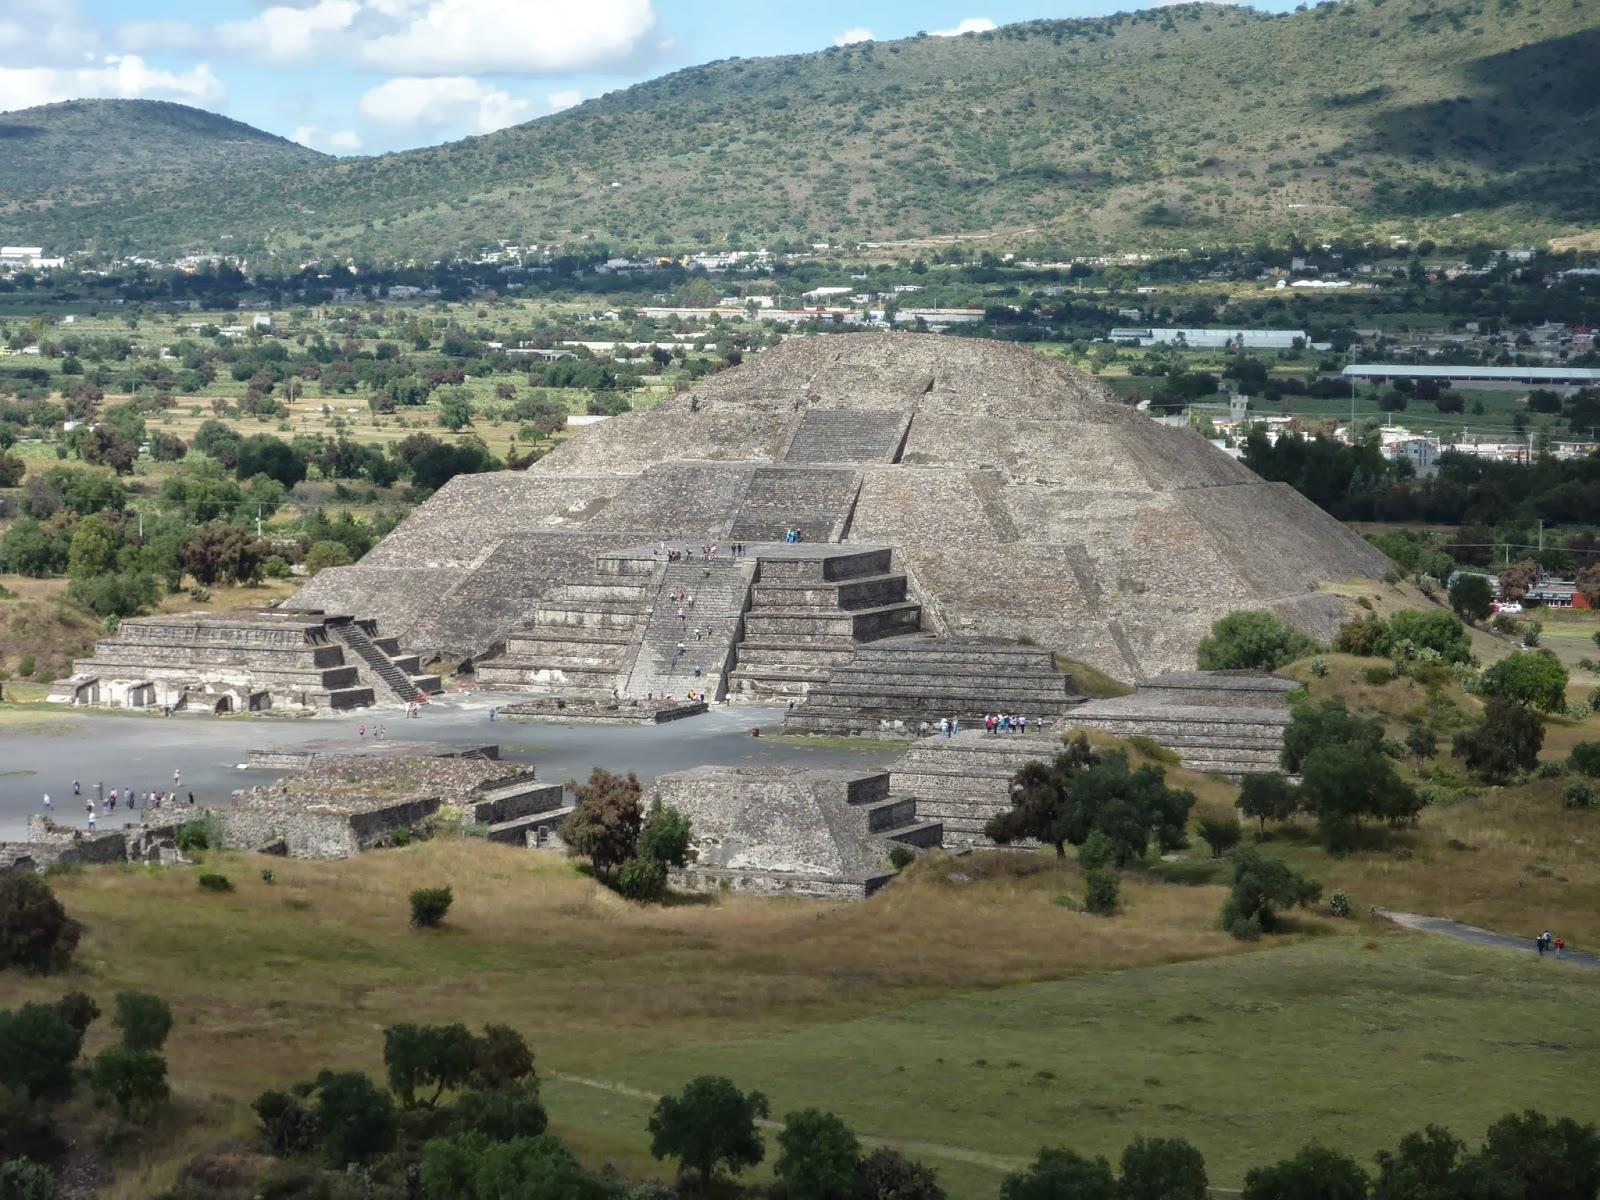 Tequila Tabasco Tamales Teotihuacan Pyramids